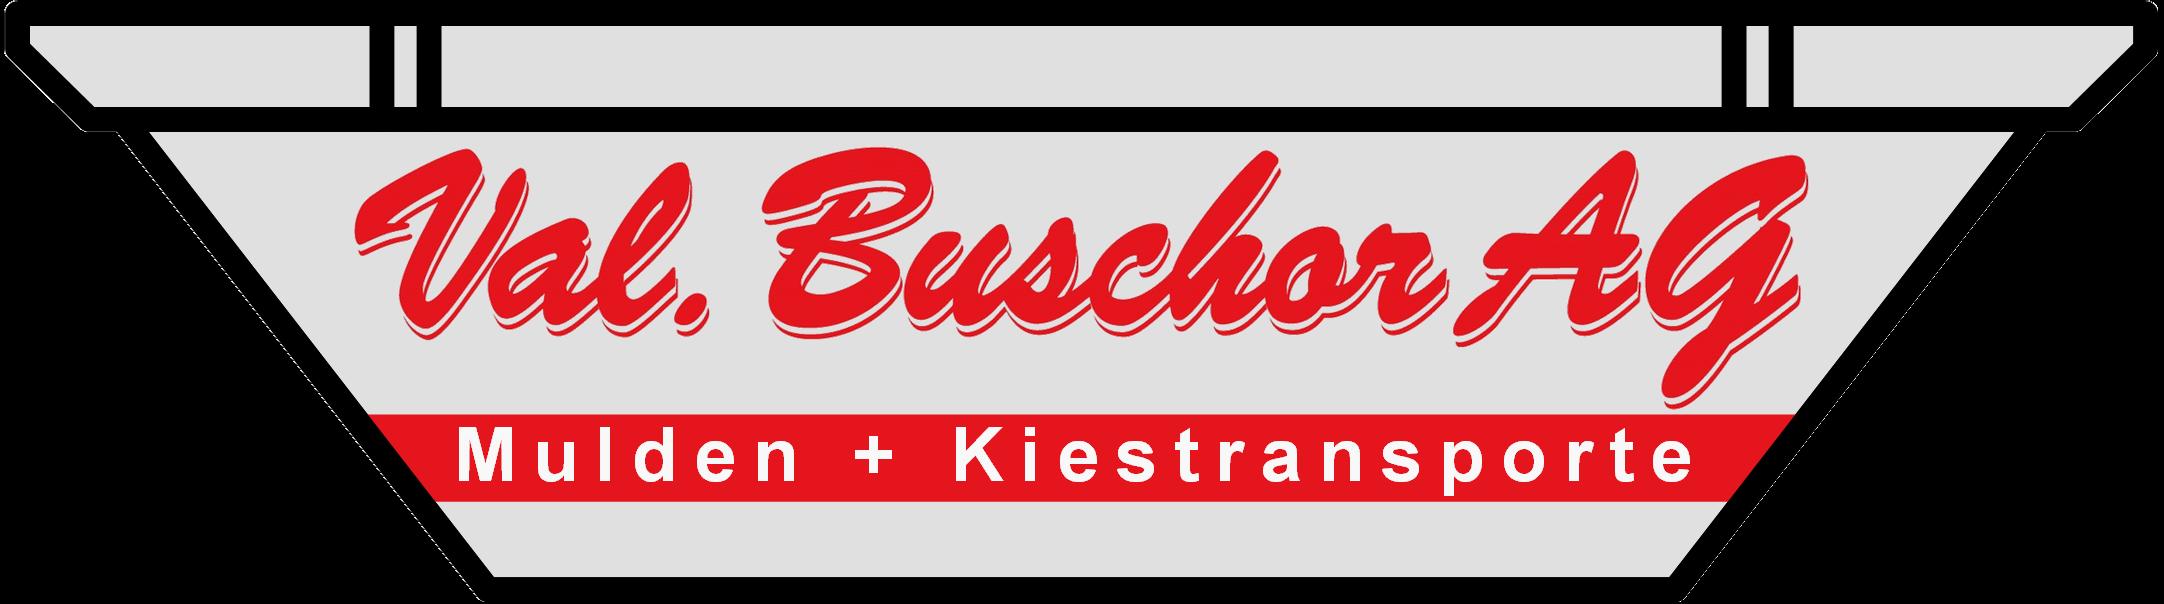 Val Buschor AG